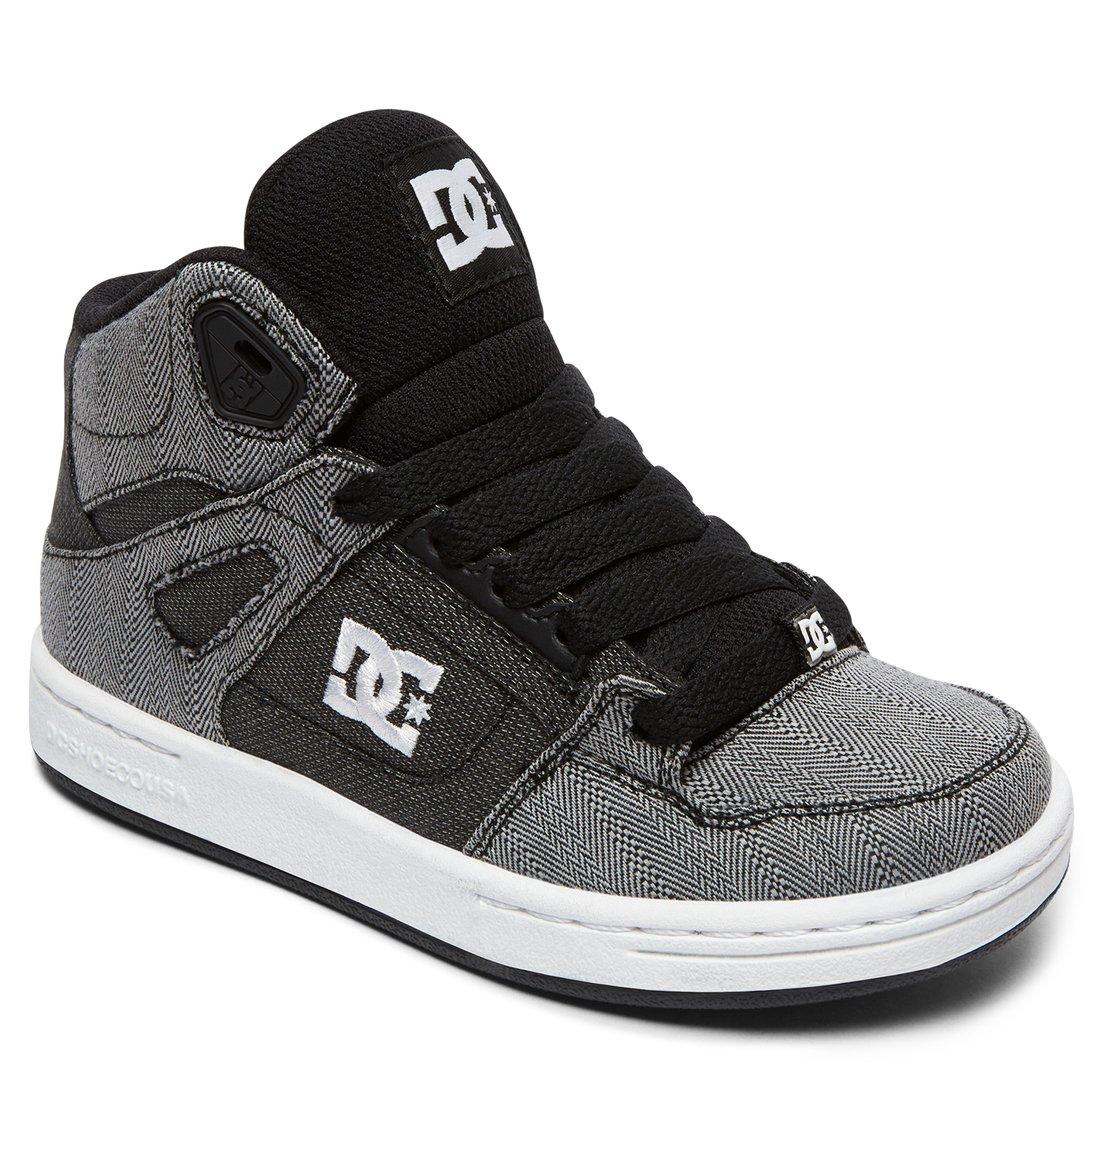 7d8507d4c 1 Pure High TX SE - Zapatillas Altas para Chicos ADBS100243 DC Shoes